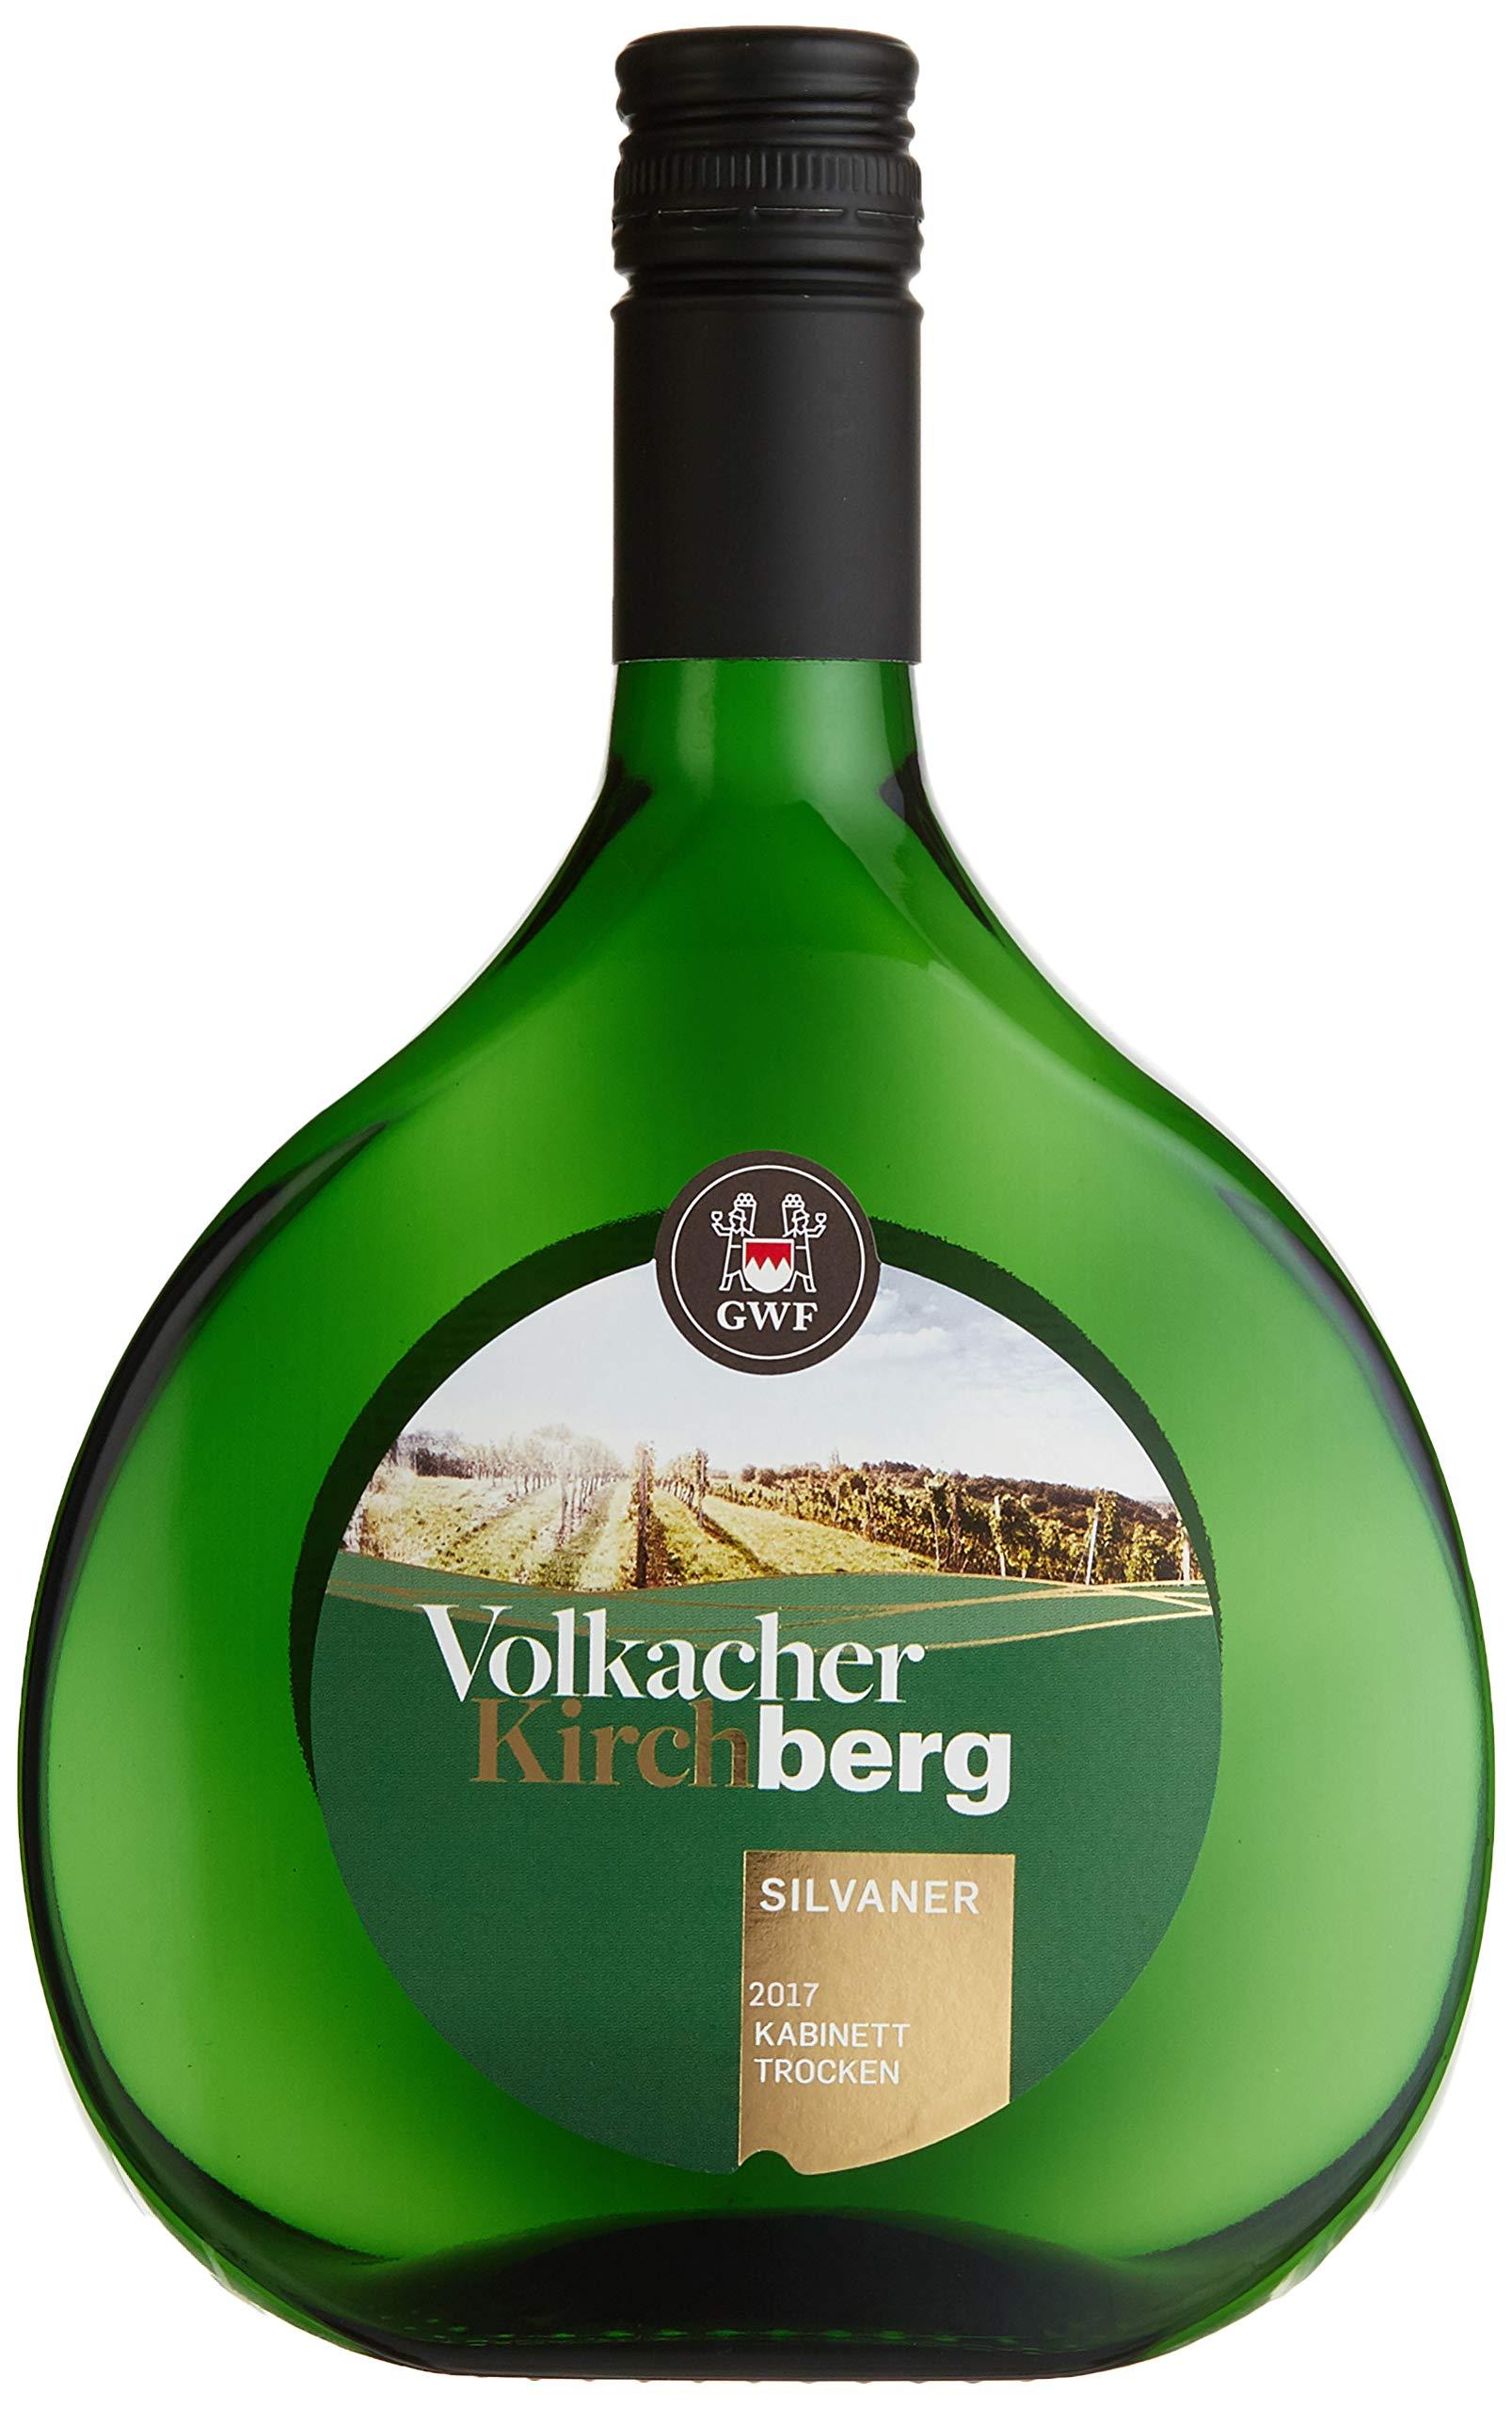 Volkacher-Kirchberg-Silvaner-Kabinett-trocken-2017-Weiwein-6-x-075-l